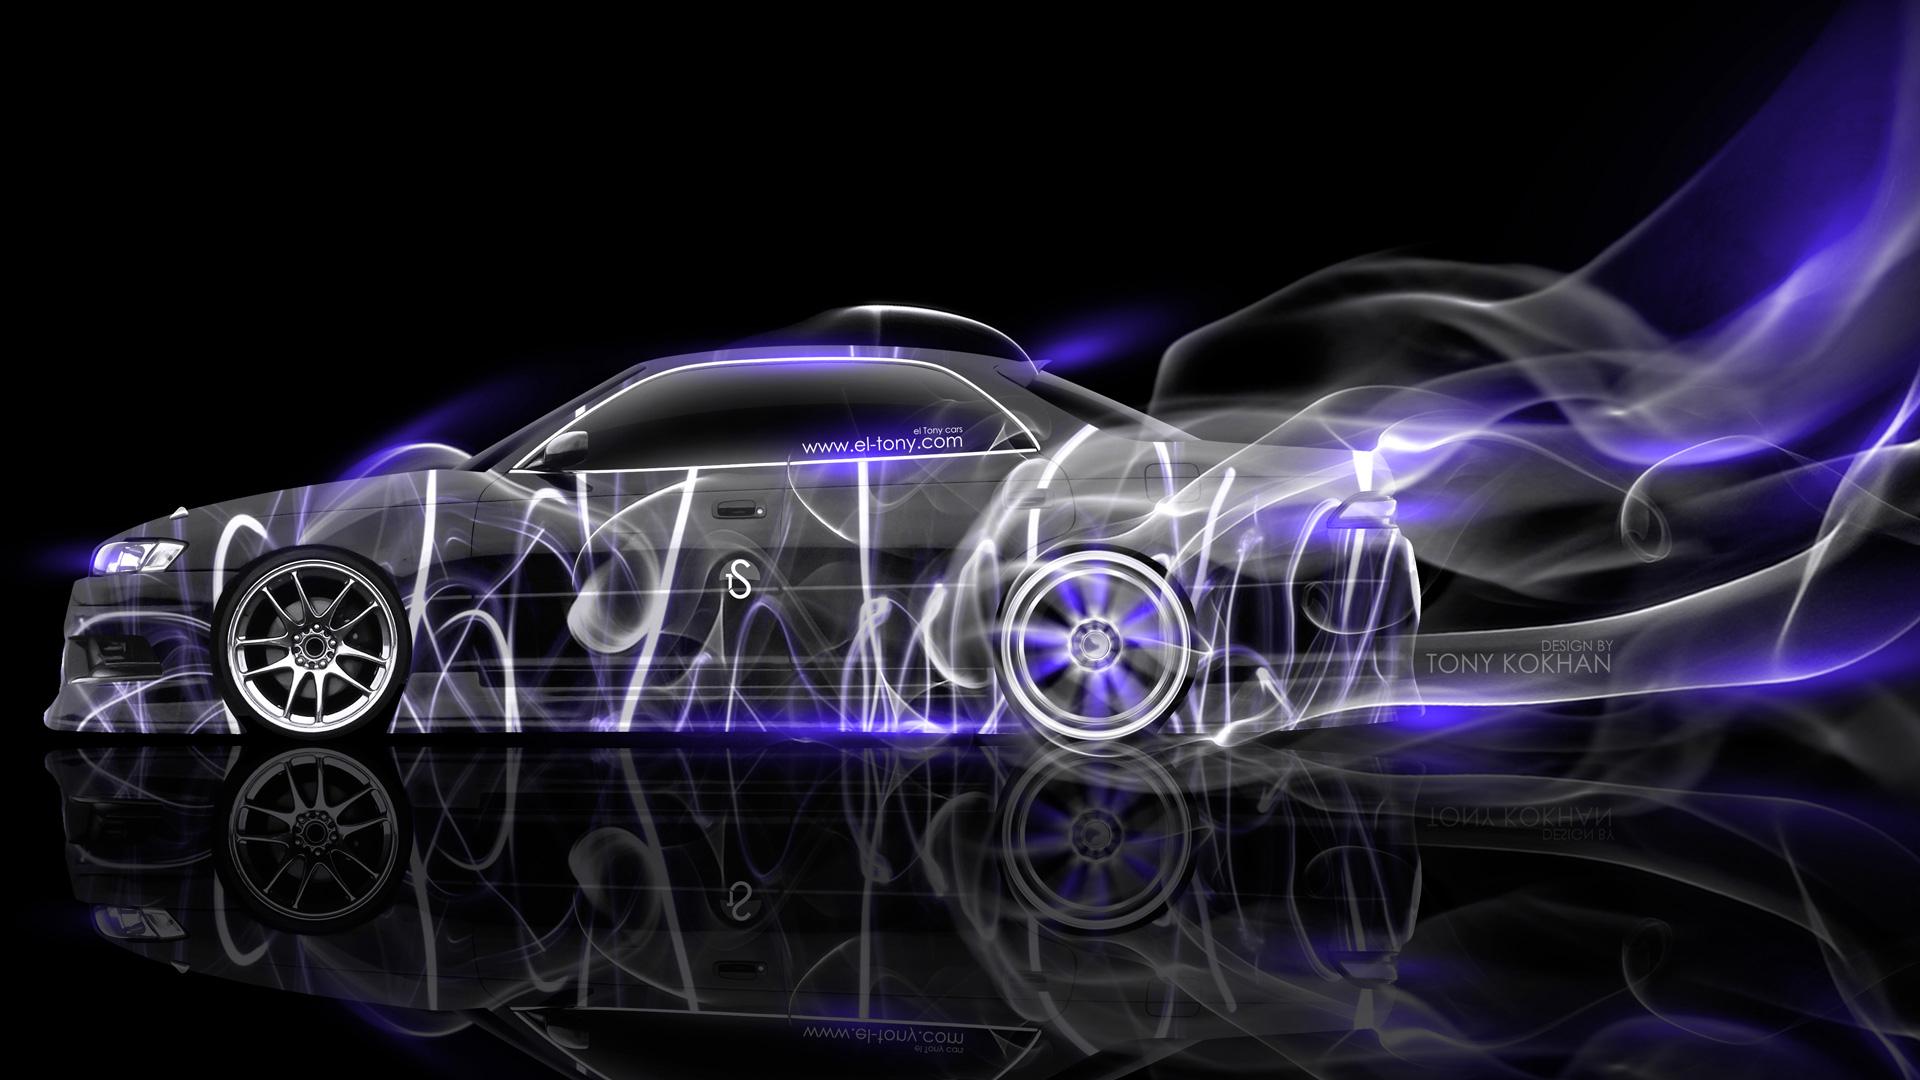 Toyota Mark 2 JZX90 JDM Super Smoke Drift Car 2014 Photoshop Violet ...